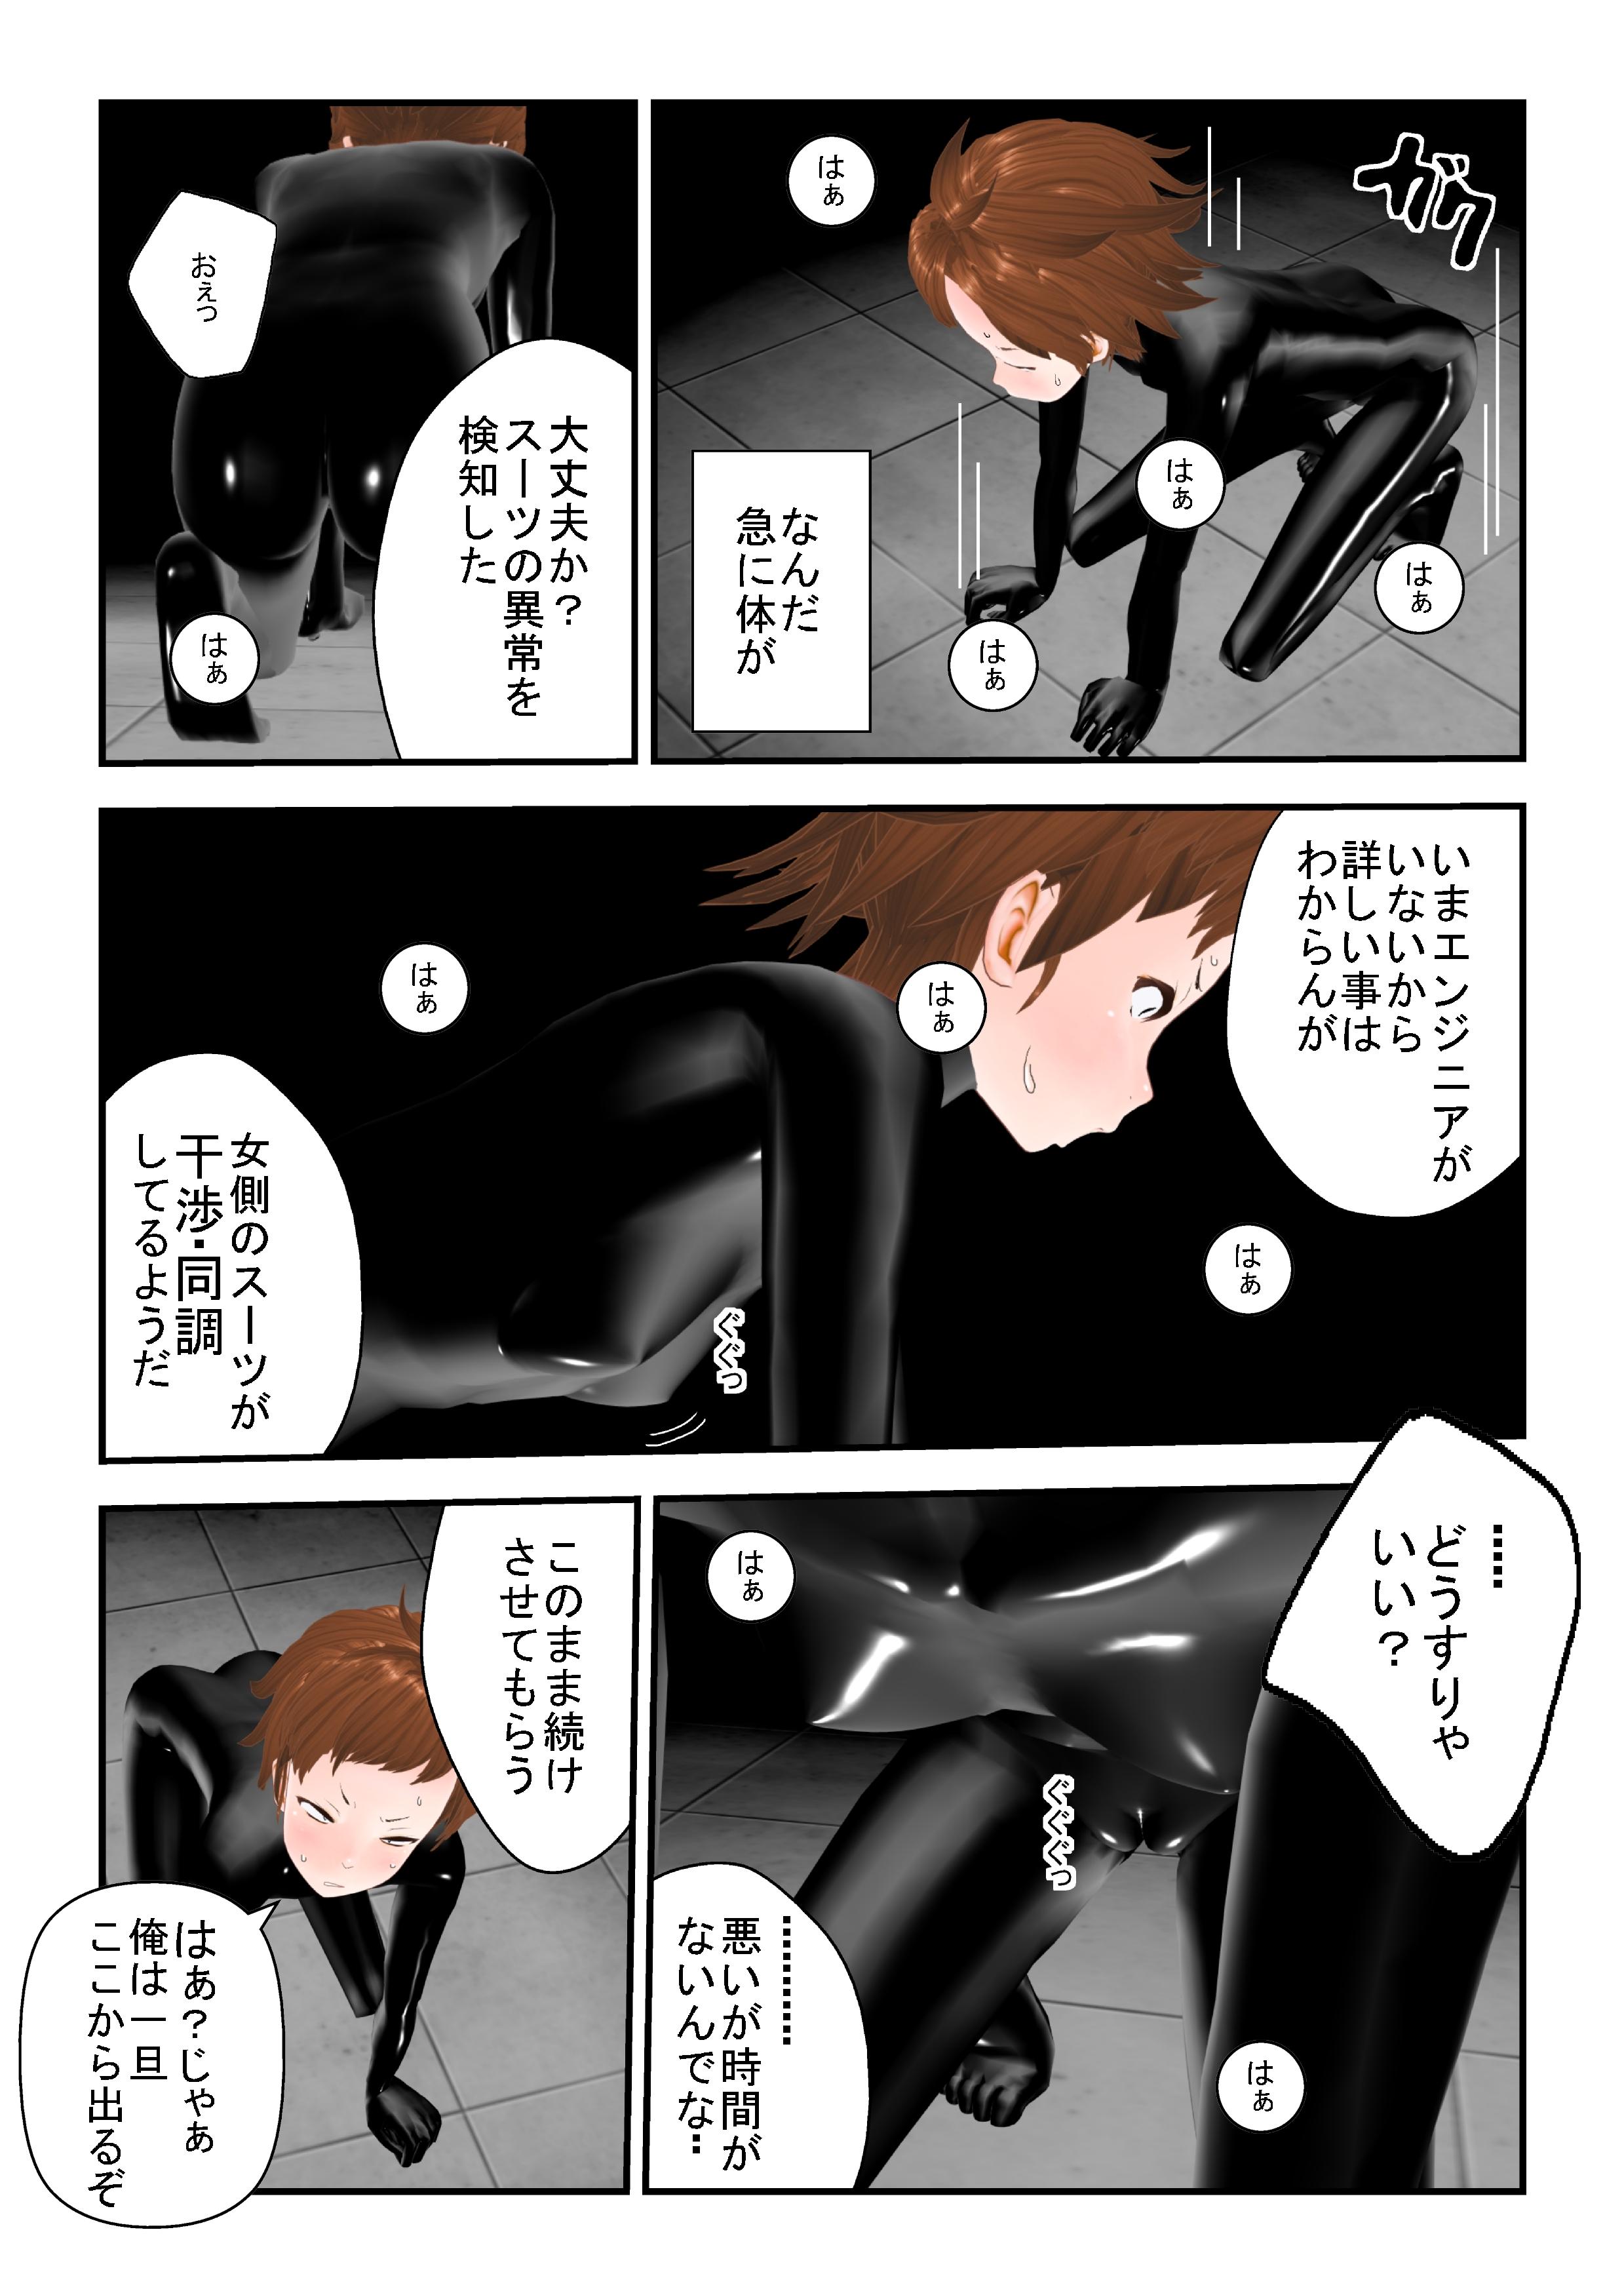 shi_0009.jpg